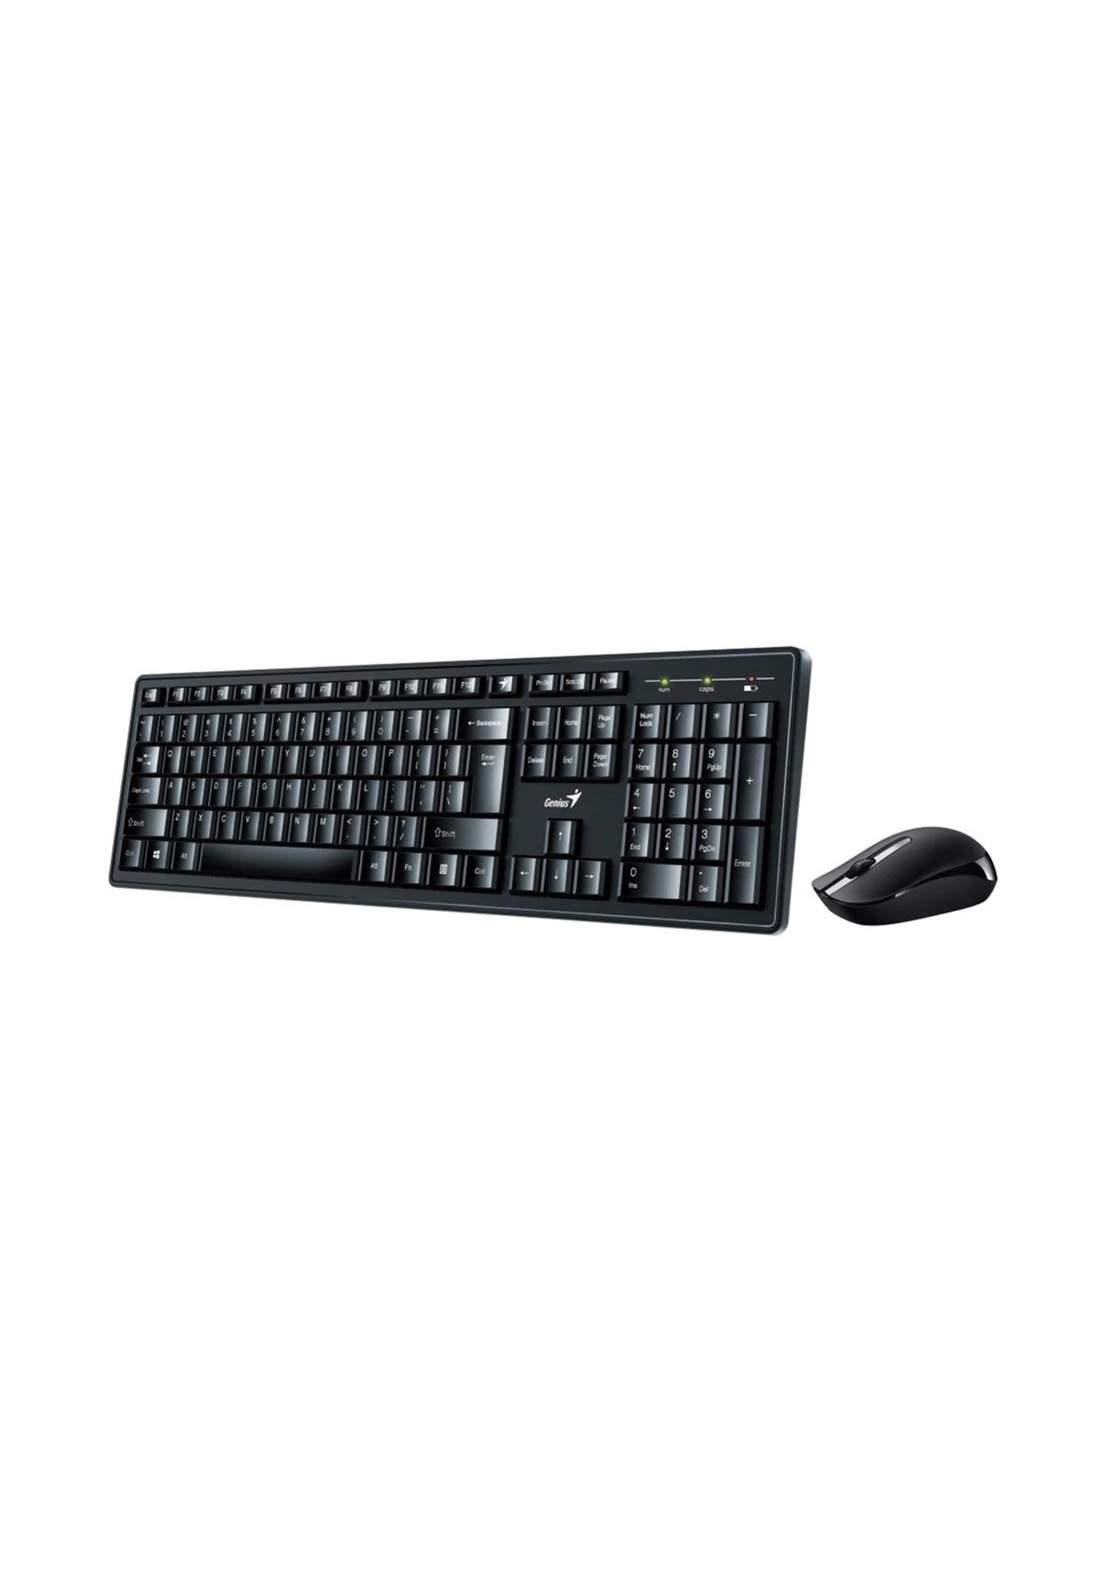 Genius Smart KM-8200 Wireless Keyboard and Mouse - Black كيبورد وماوس